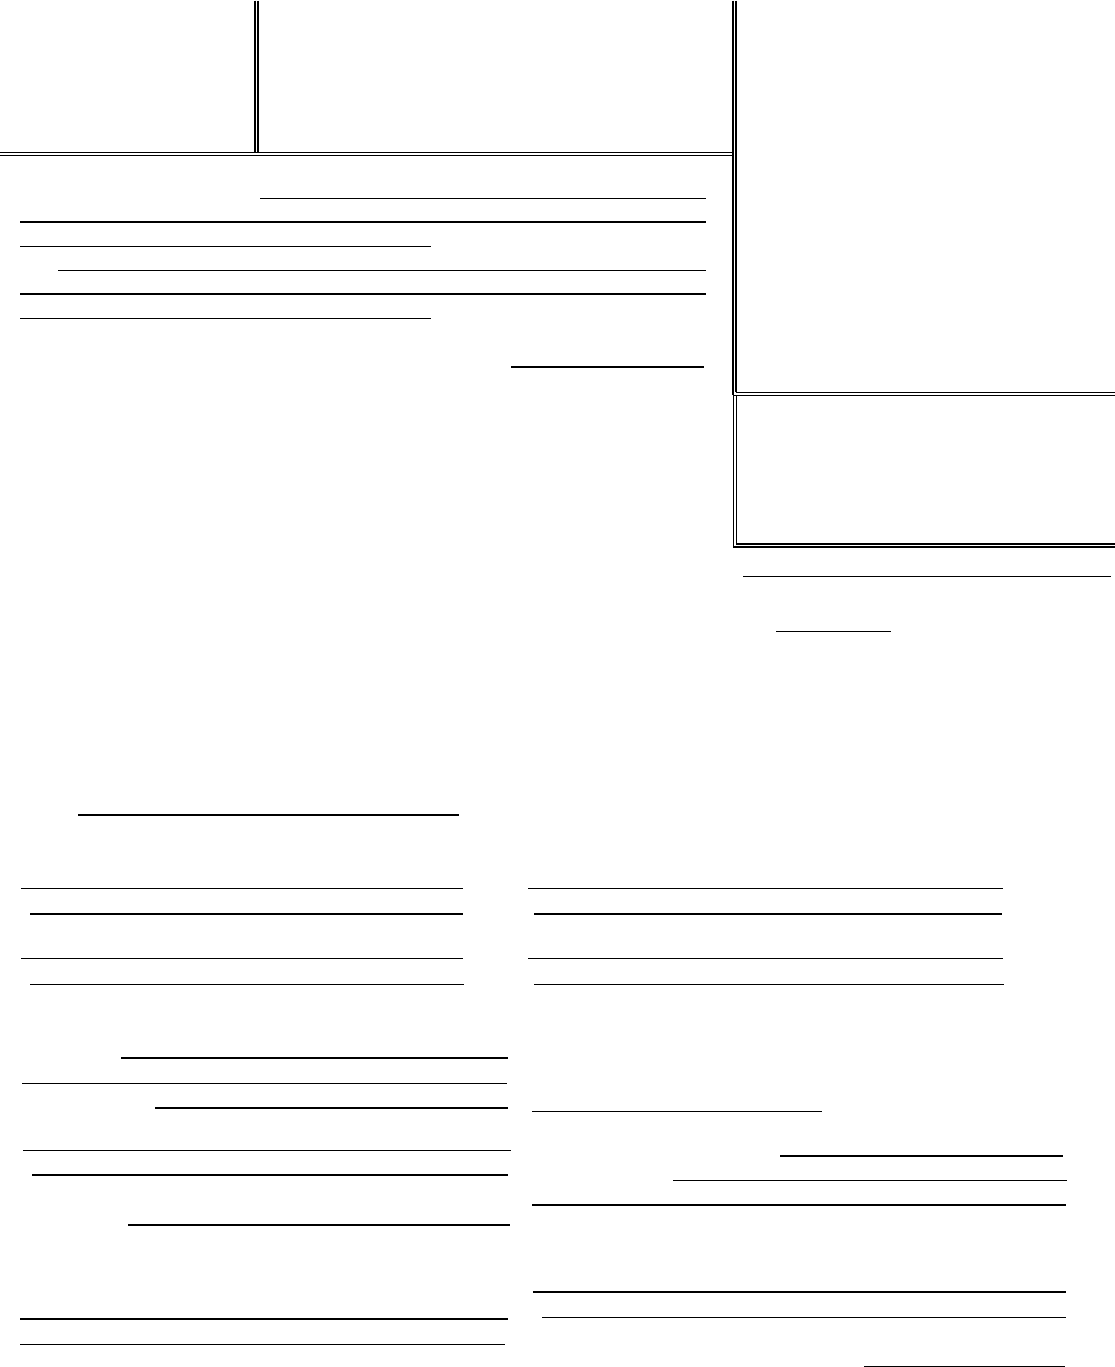 Free Wisconsin Quitclaim Deed Form - PDF